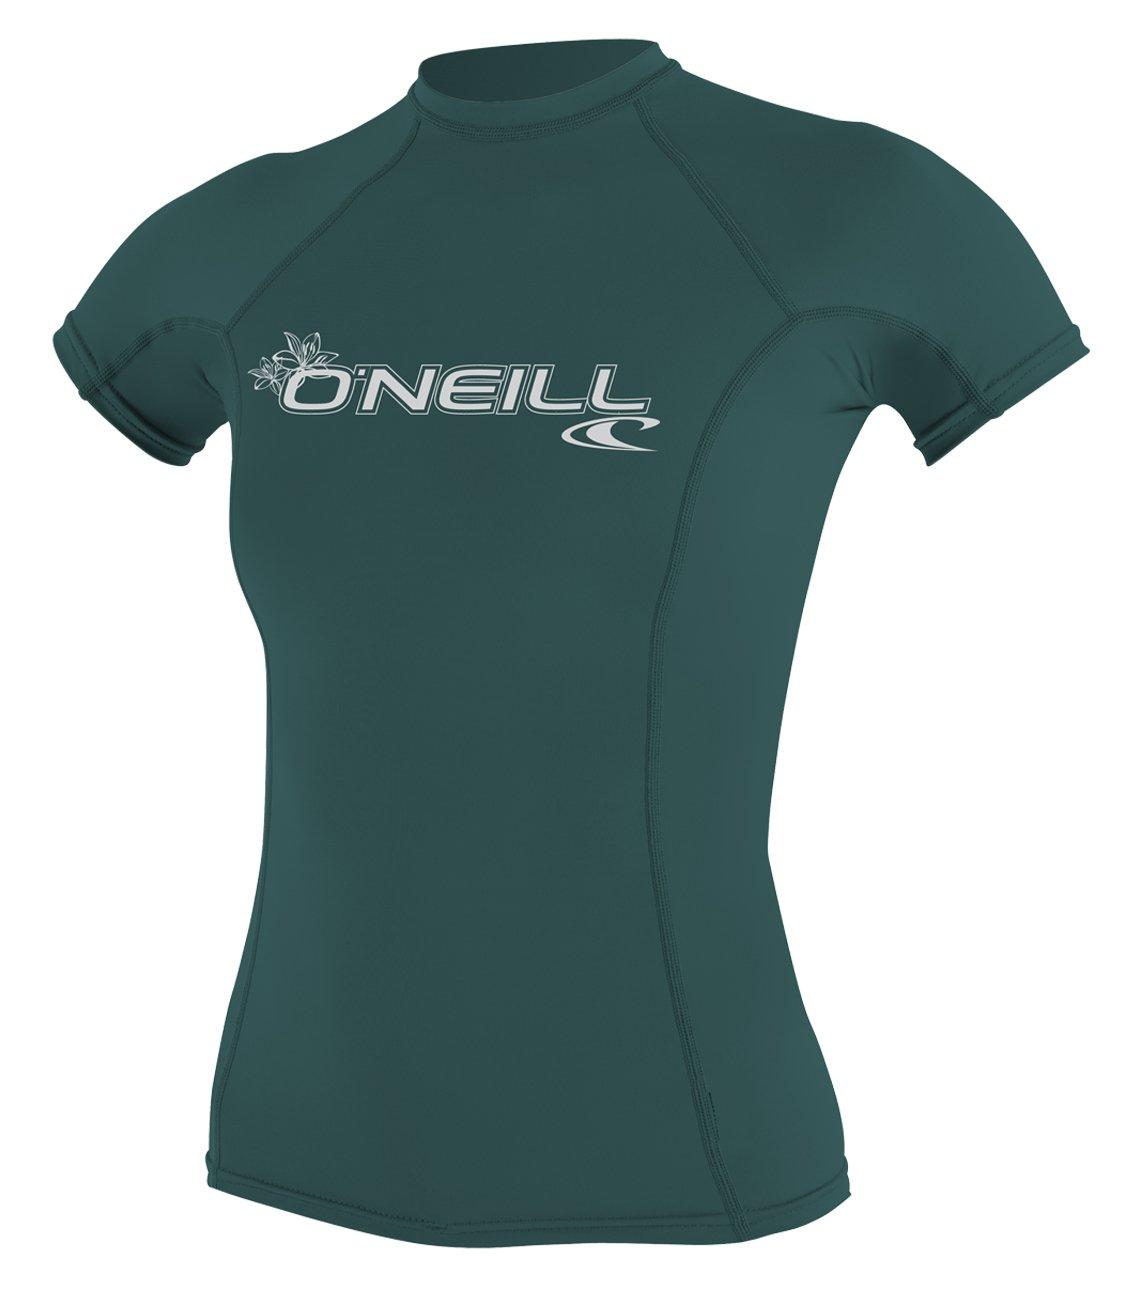 O'Neill Women's Basic 50+ Skins Short Sleeve Rash Guard, Deep Teal, X-Small by O'Neill Wetsuits